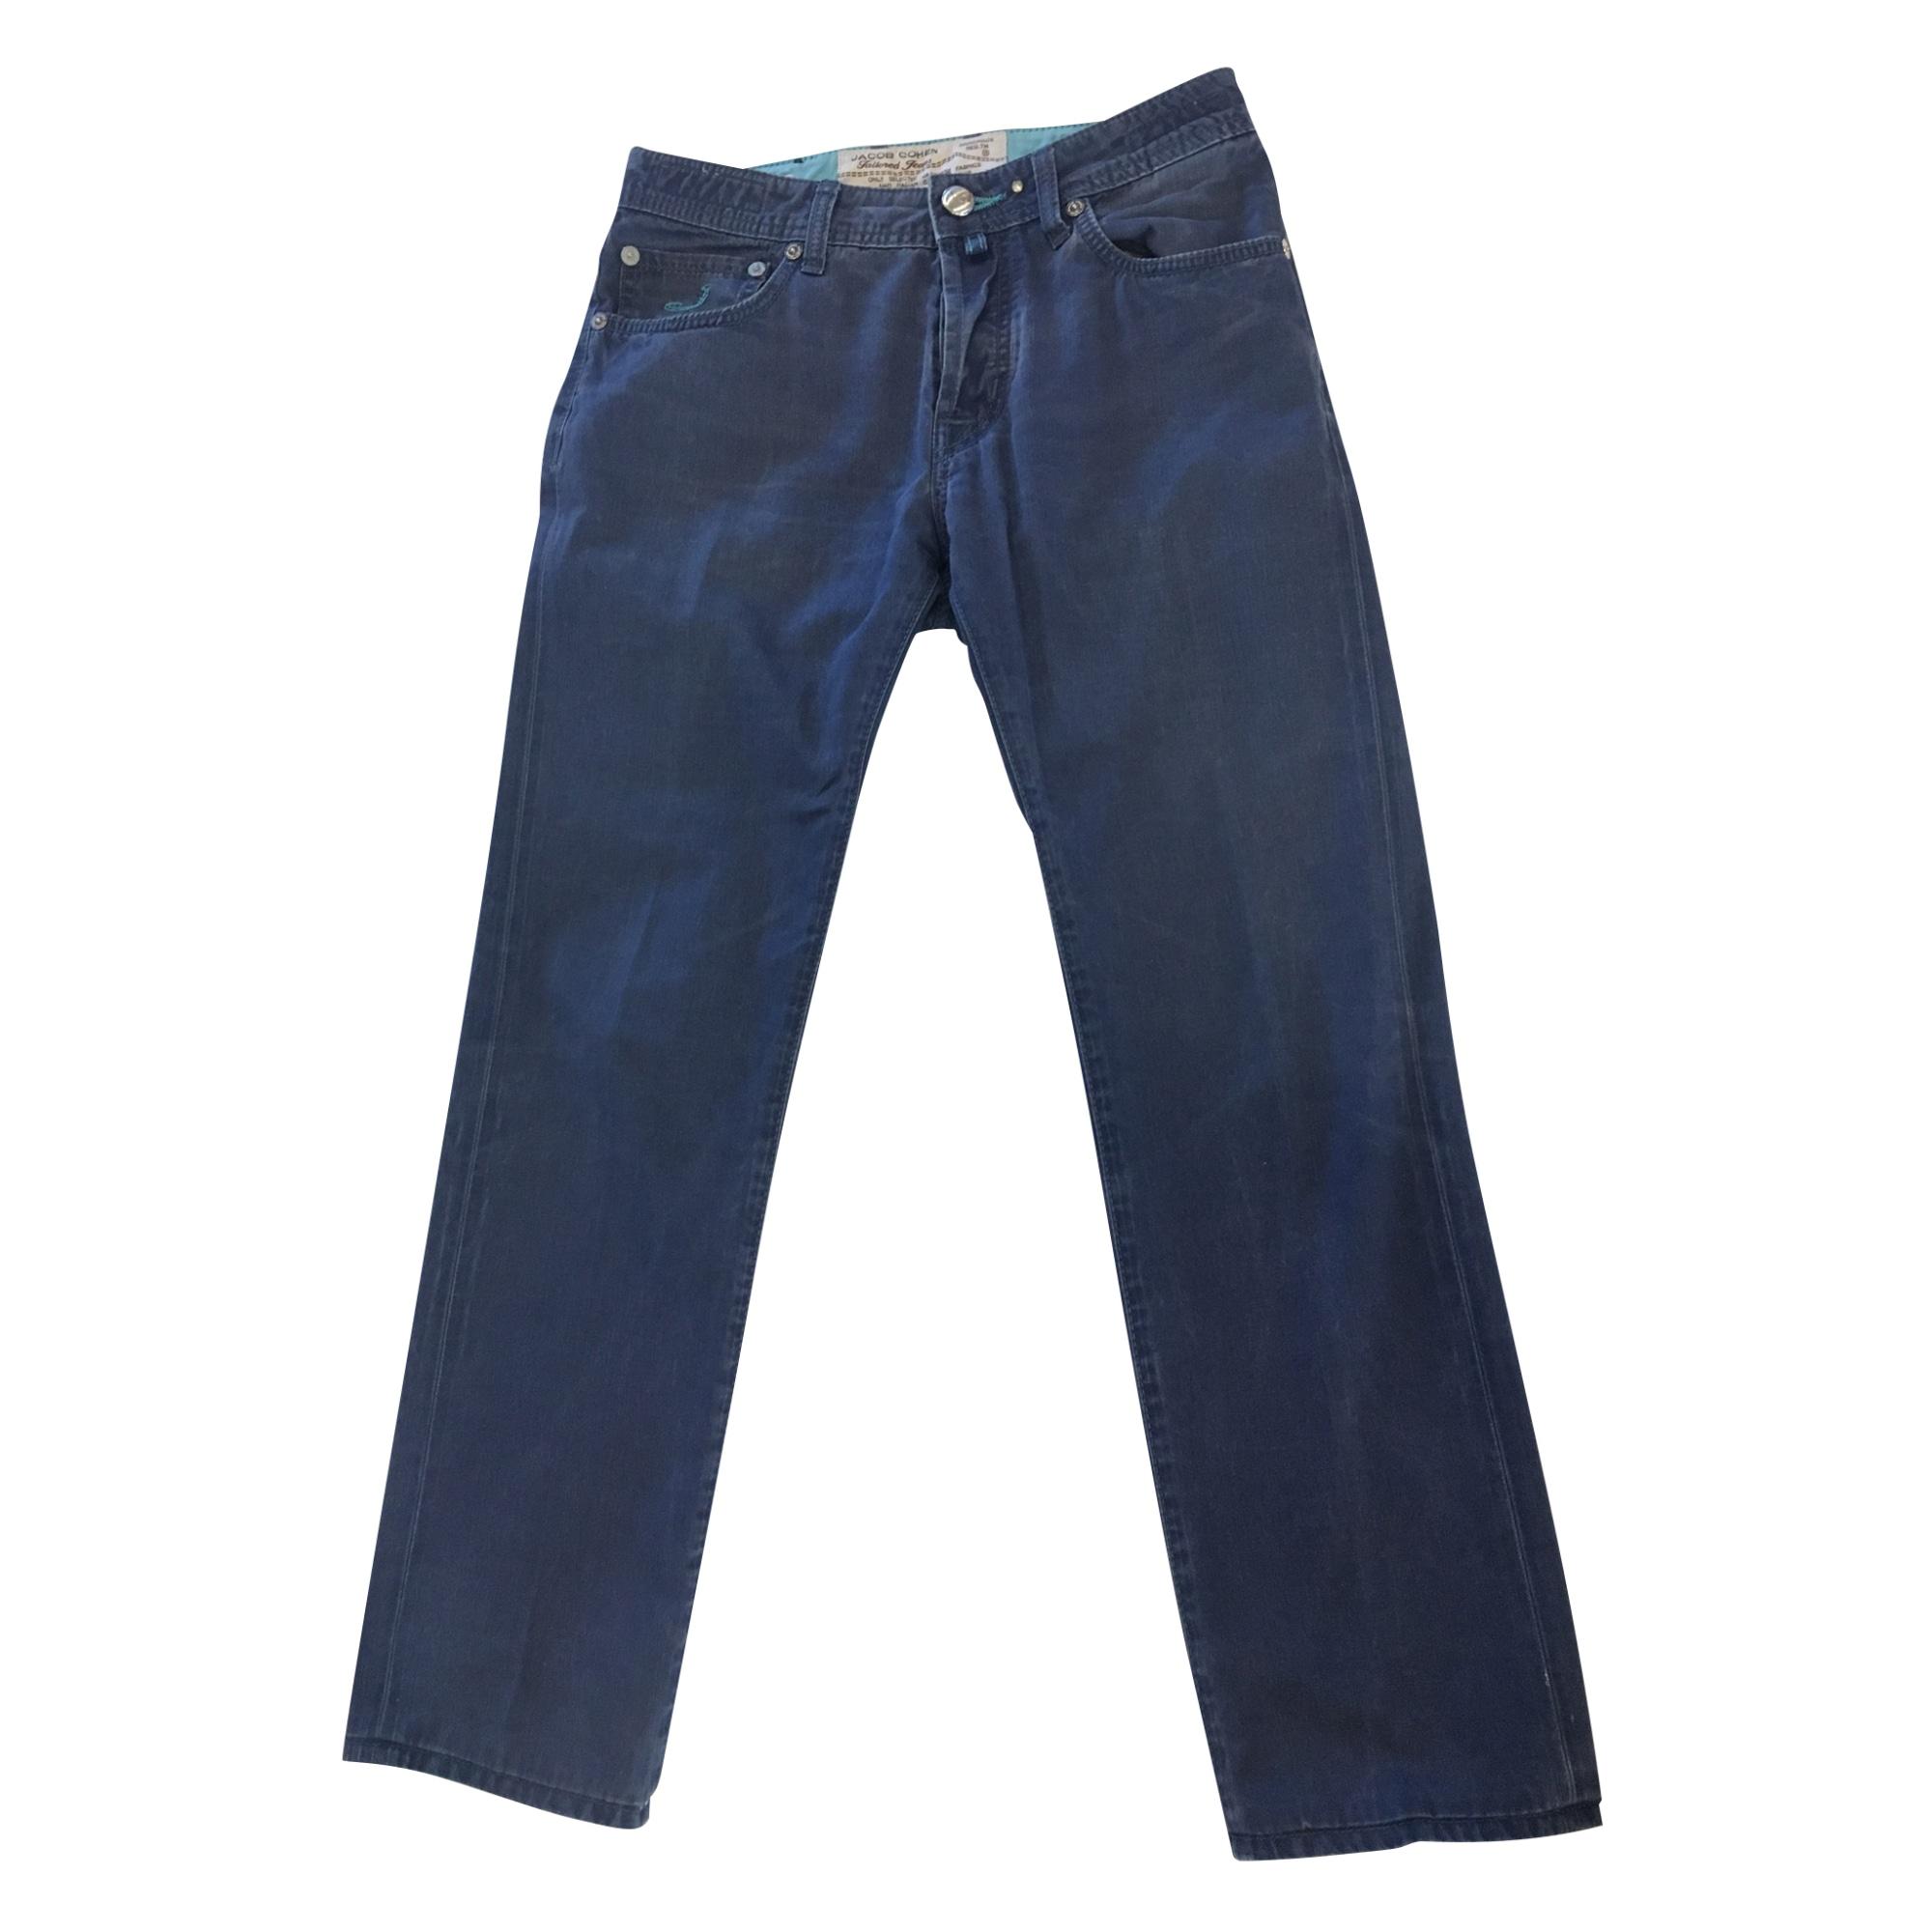 Straight Leg Pants JACOB COHEN Blue, navy, turquoise